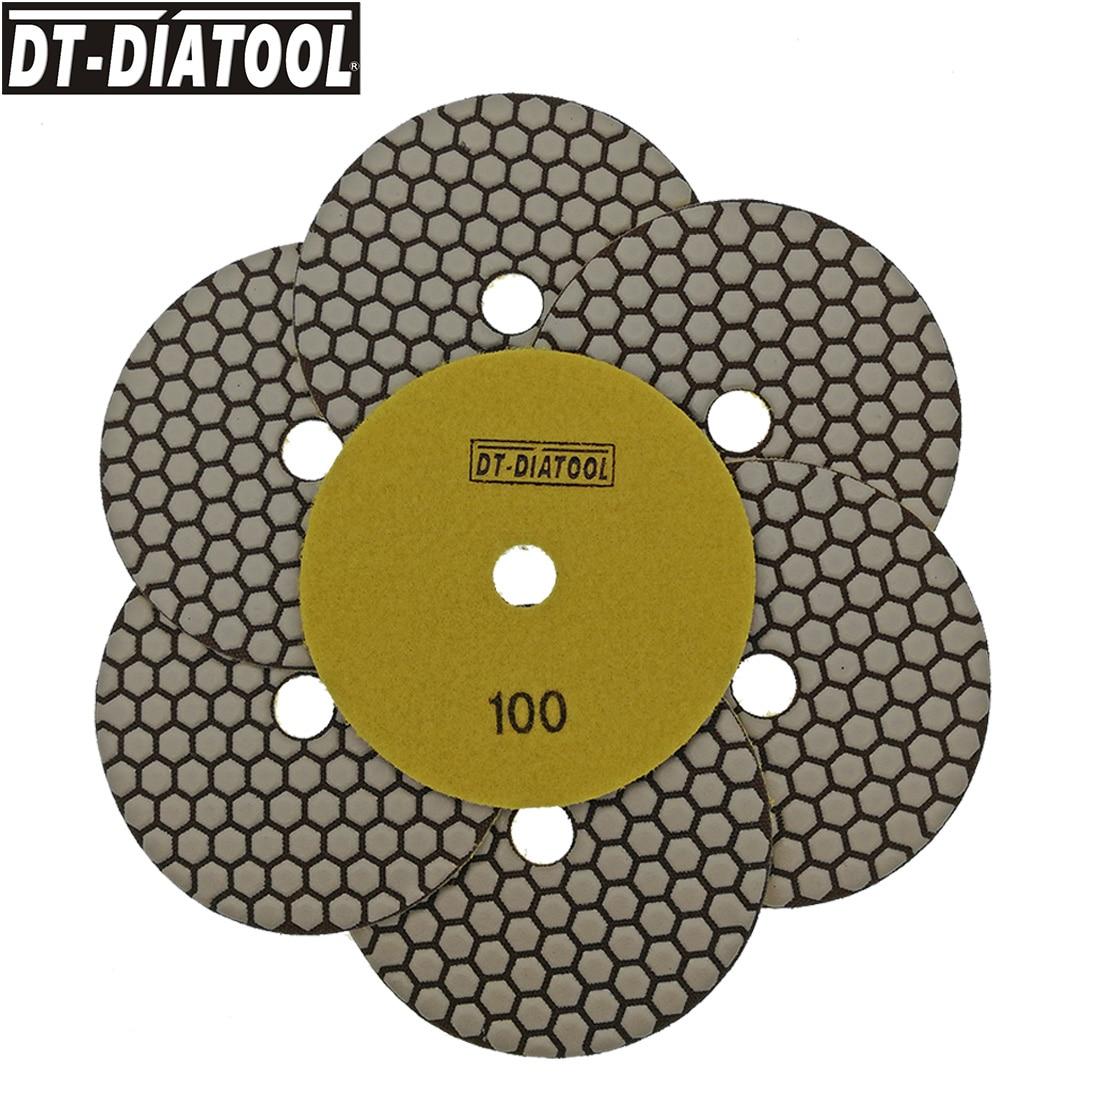 DT DIATOOL 7pcs 125mm 100 dry Sanding pads dia 5 inch Resin bond diamond flexible polishing